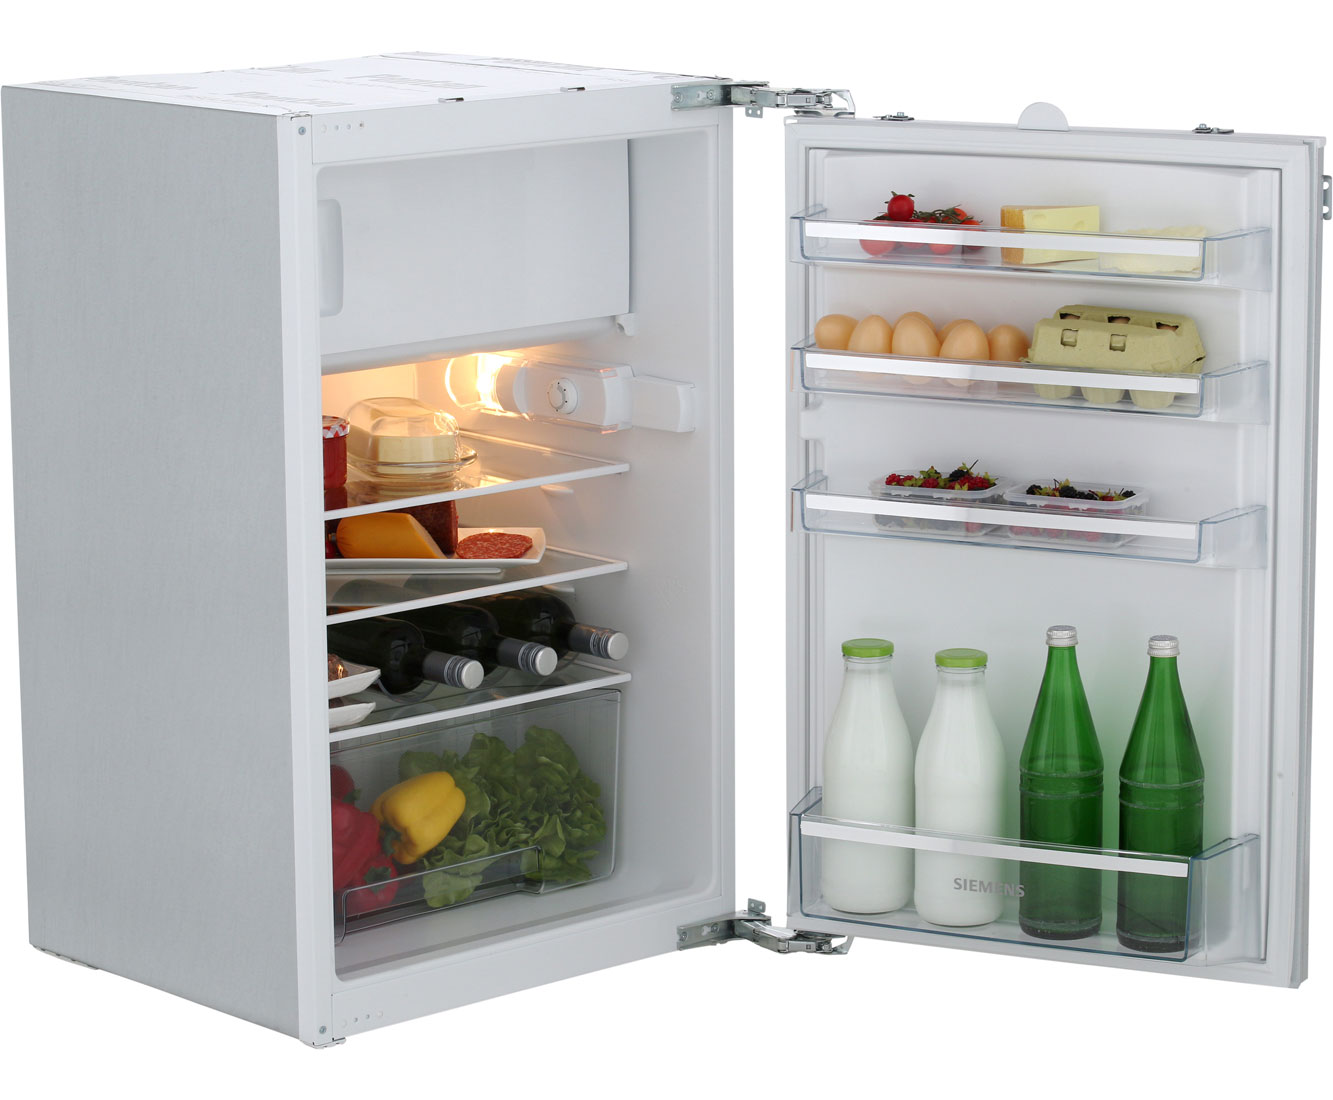 Siemens Kühlschrank Groß : Siemens ki18lv62 kühlschrank eingebaut 54cm weiß neu ebay